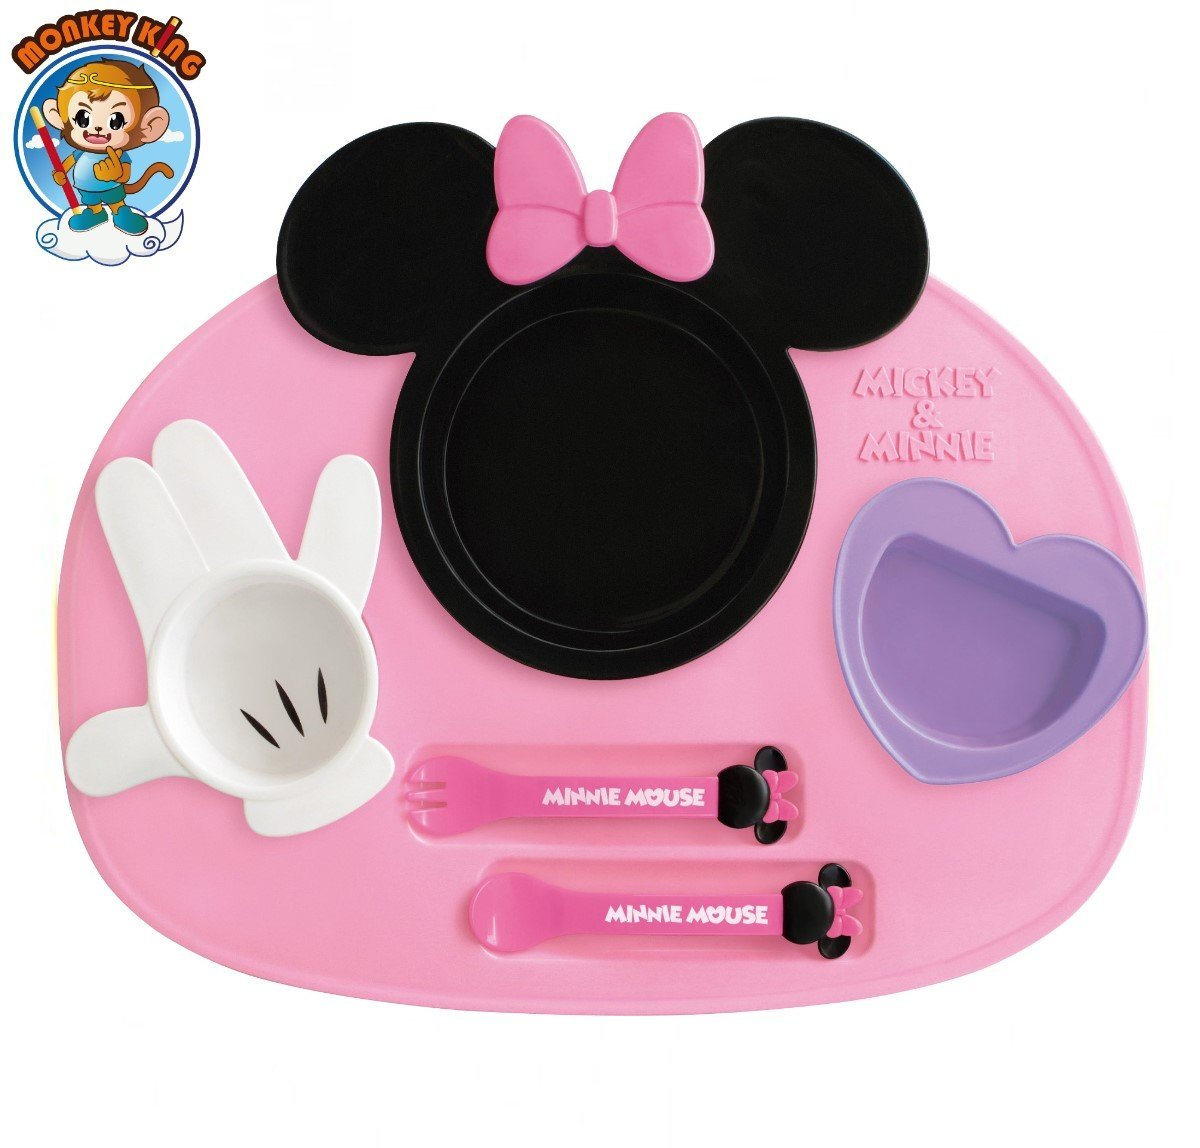 Baby Tableware Dishes Set - Minnie